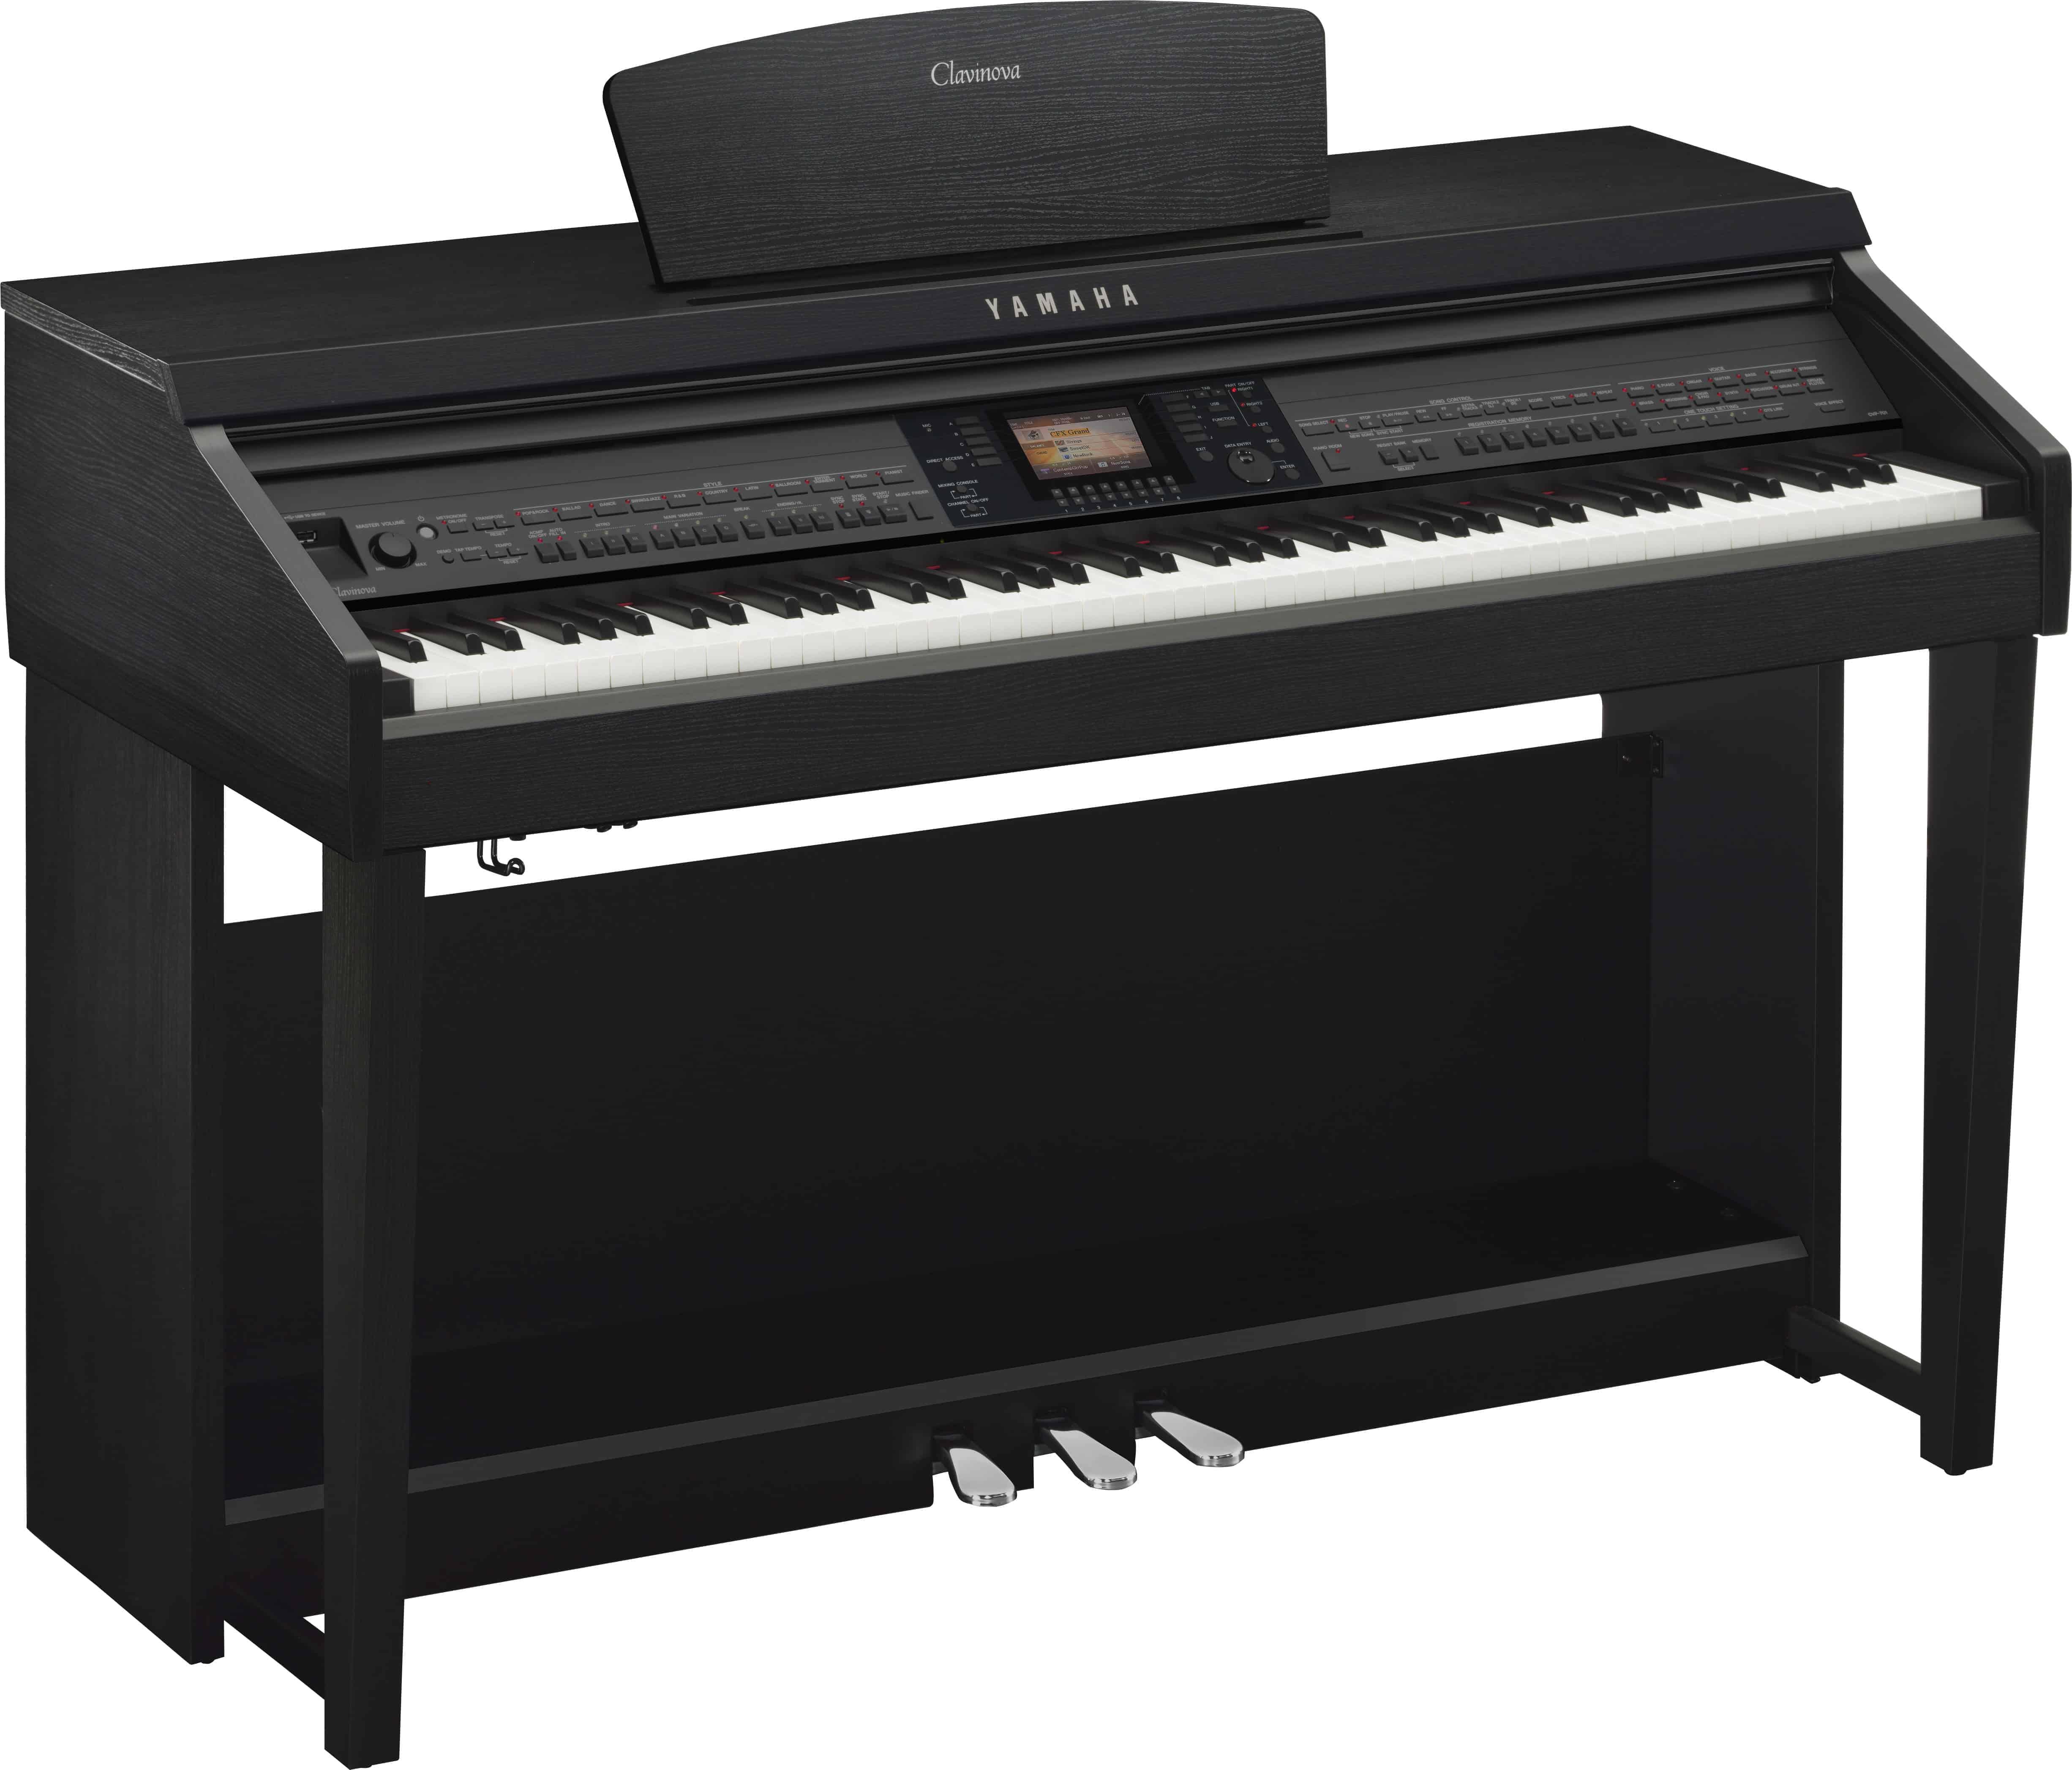 Yamaha cvp701 digital piano great digital piano for families for Yamaha clavinova cvp 87a for sale